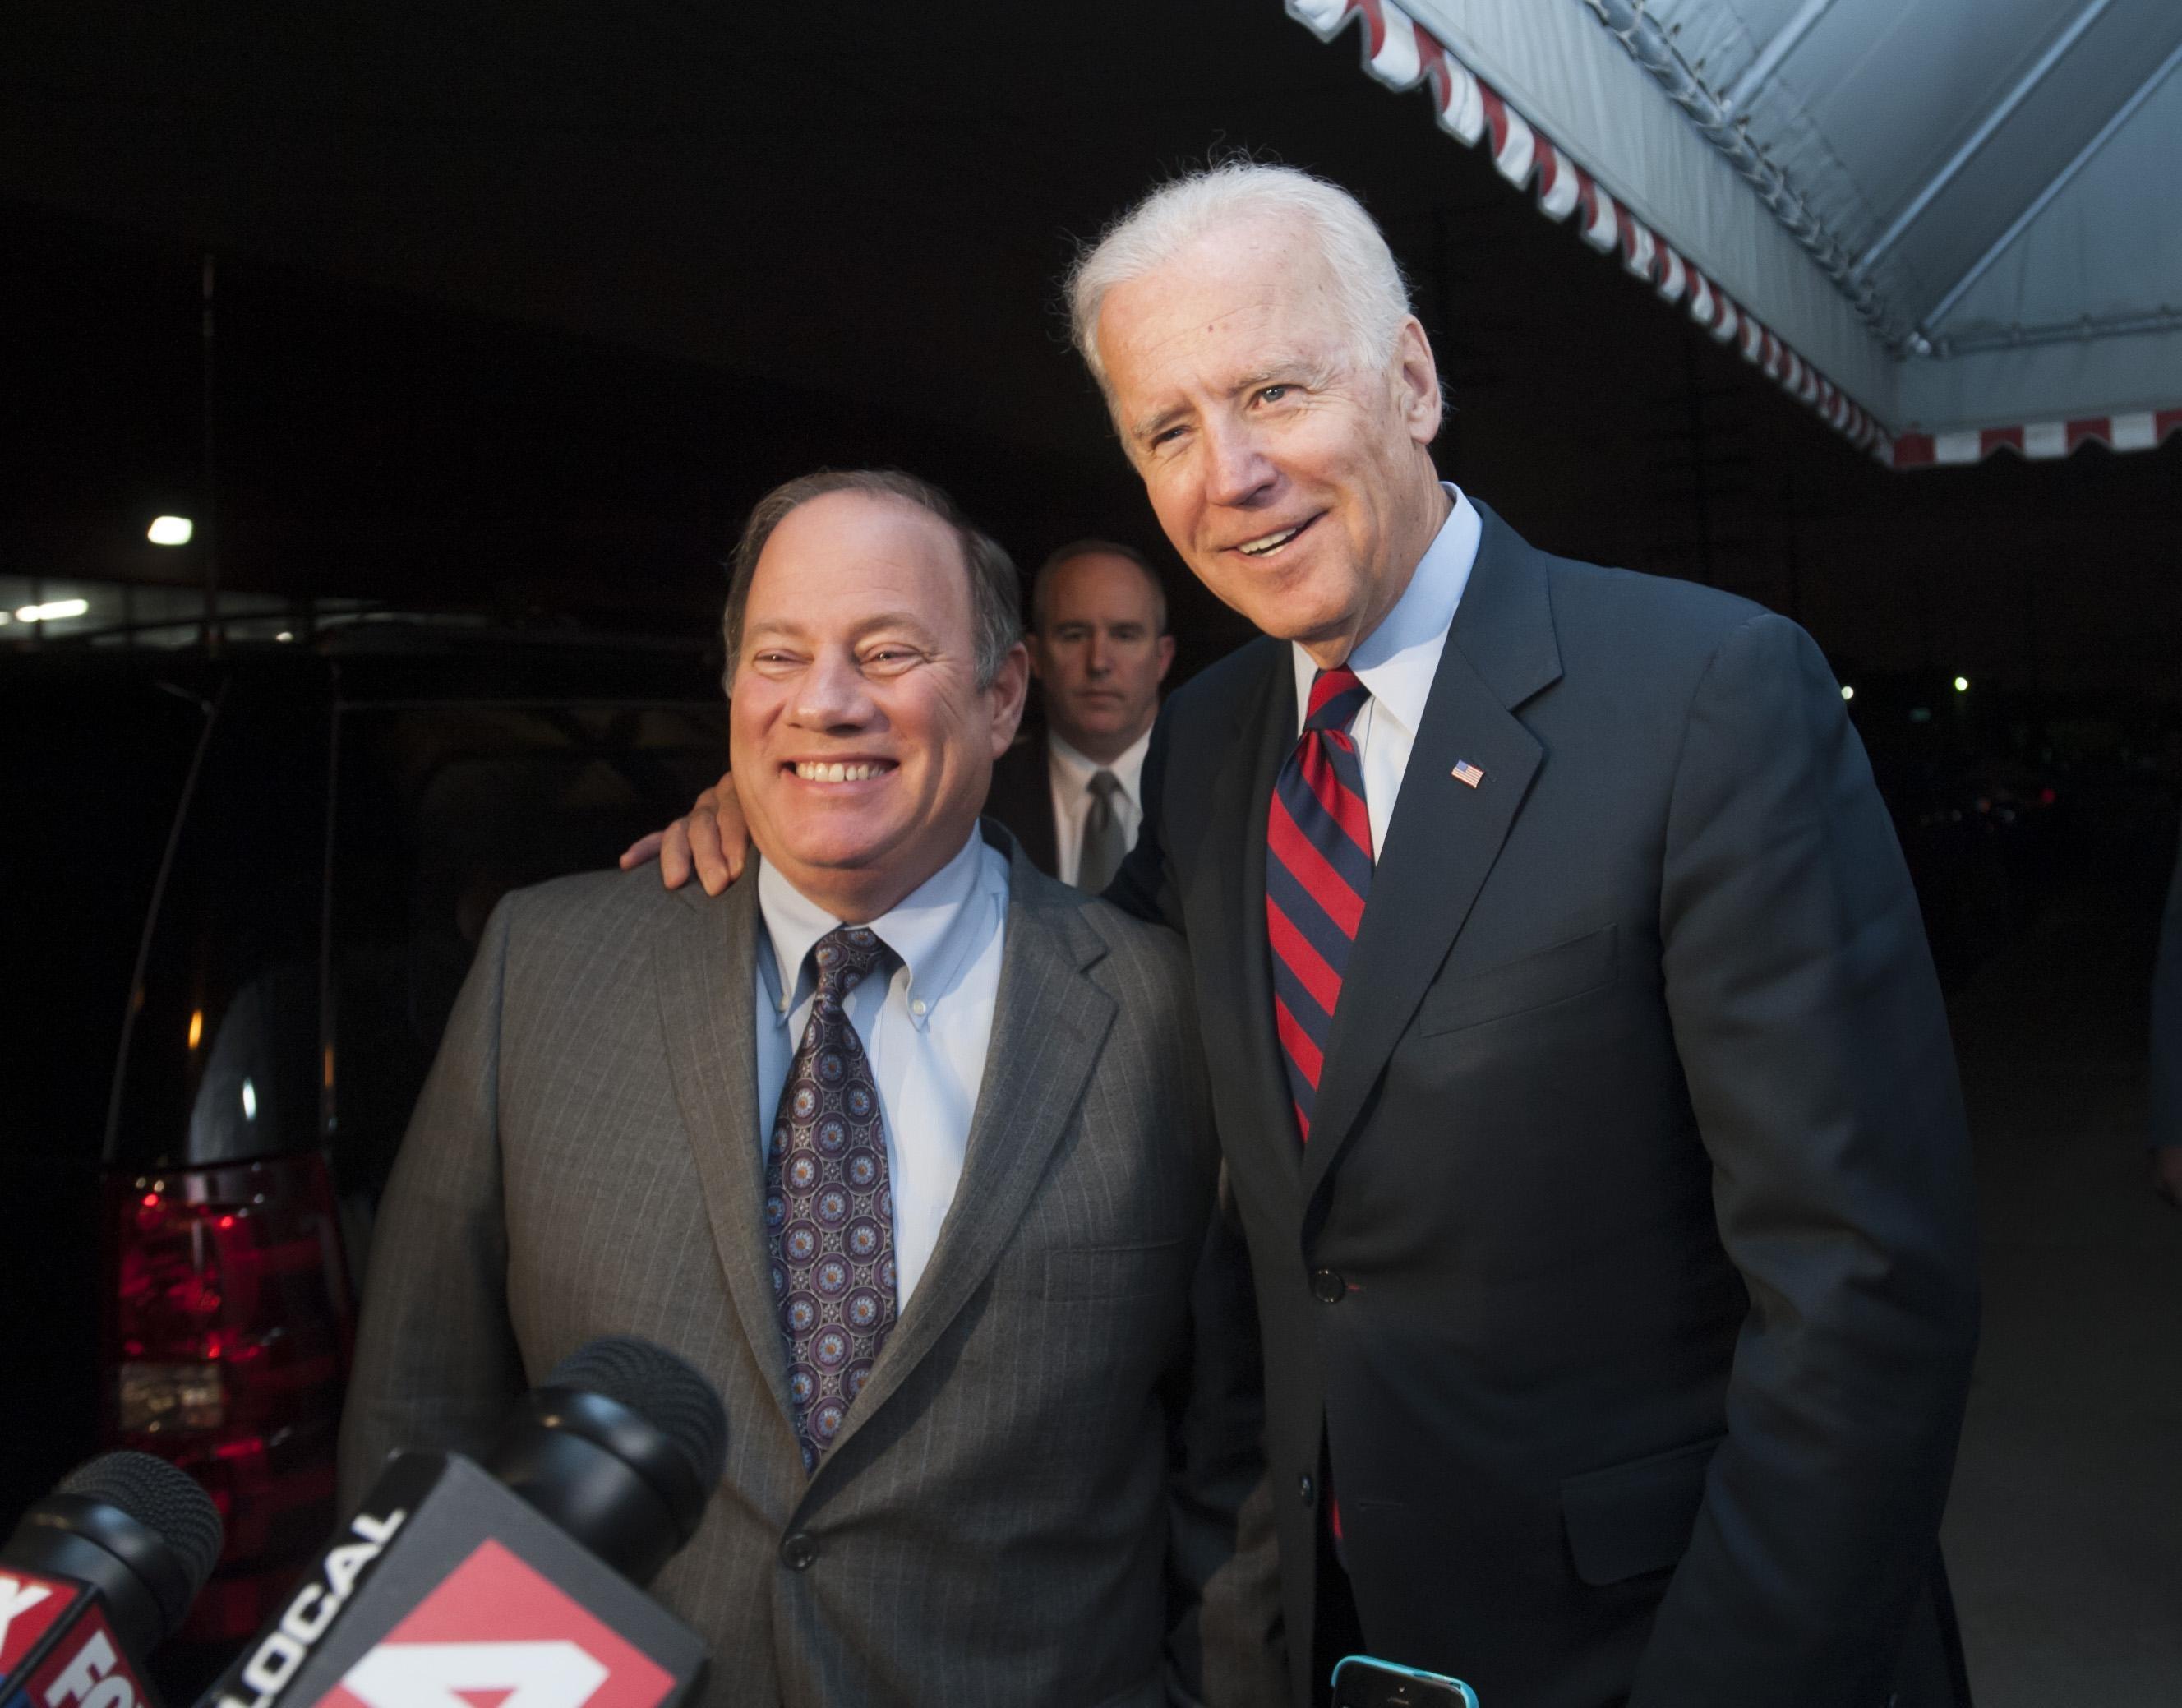 President Biden endorses Duggan for third term as Detroit's mayor